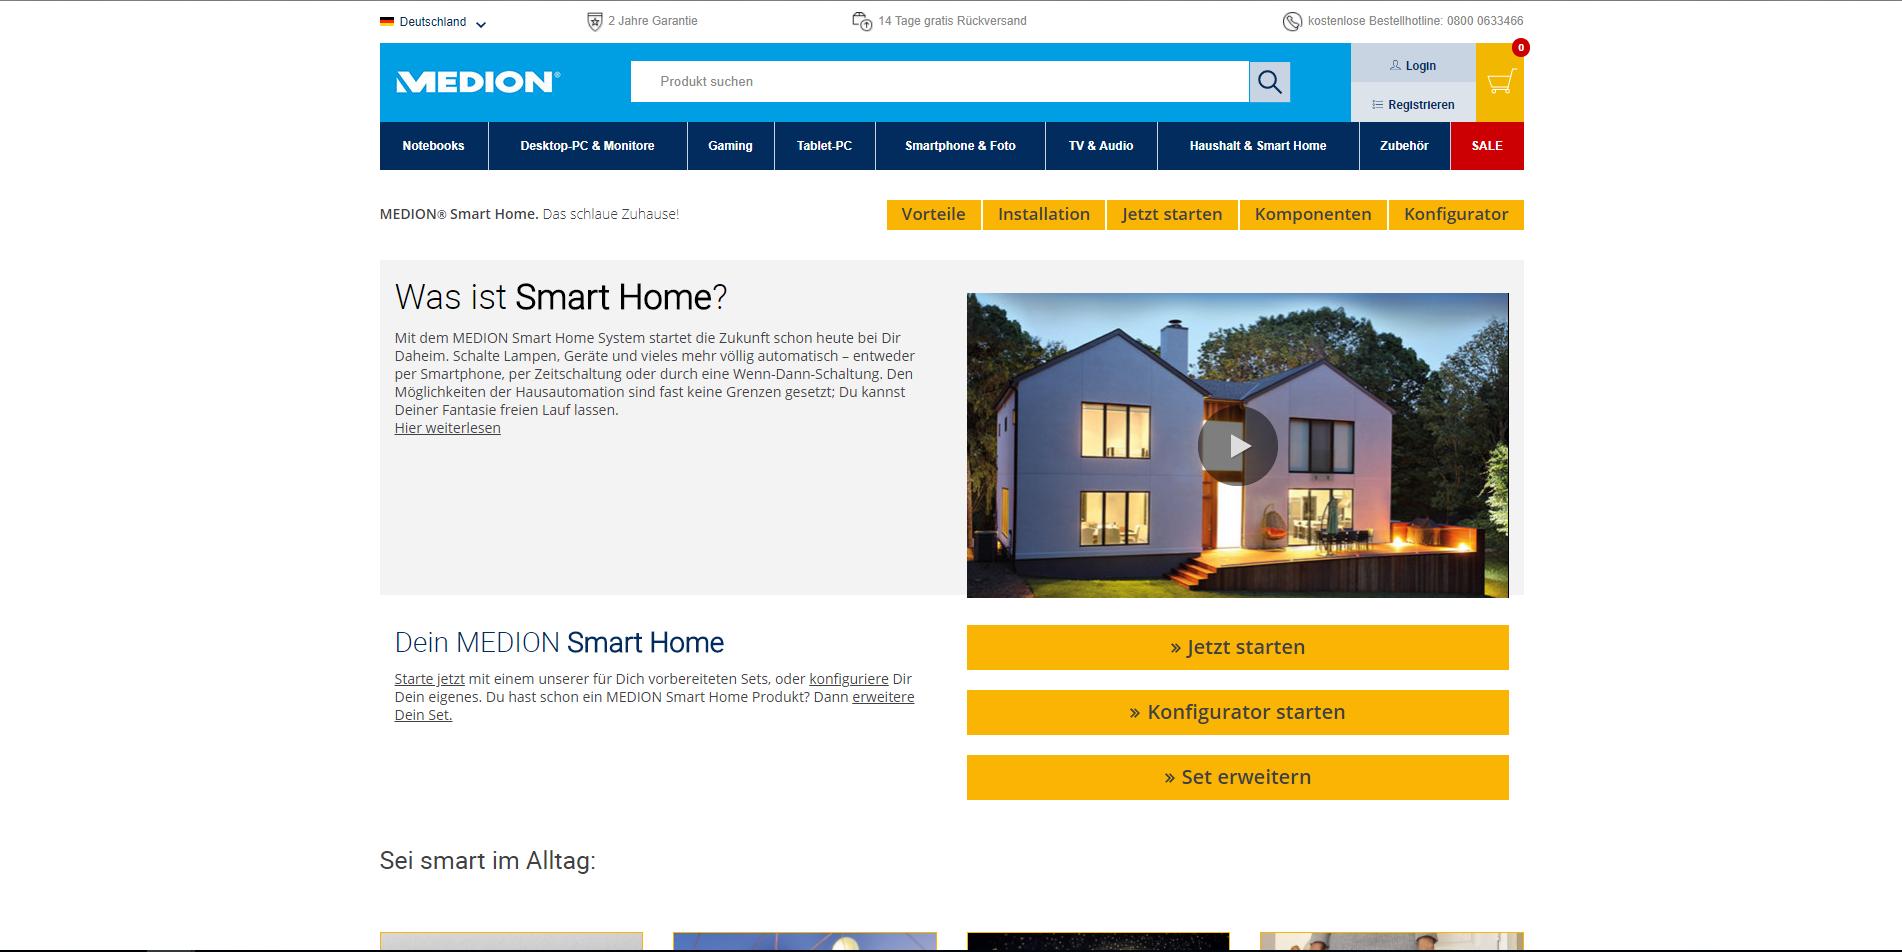 alternativen zu medion smart home die besten medion. Black Bedroom Furniture Sets. Home Design Ideas